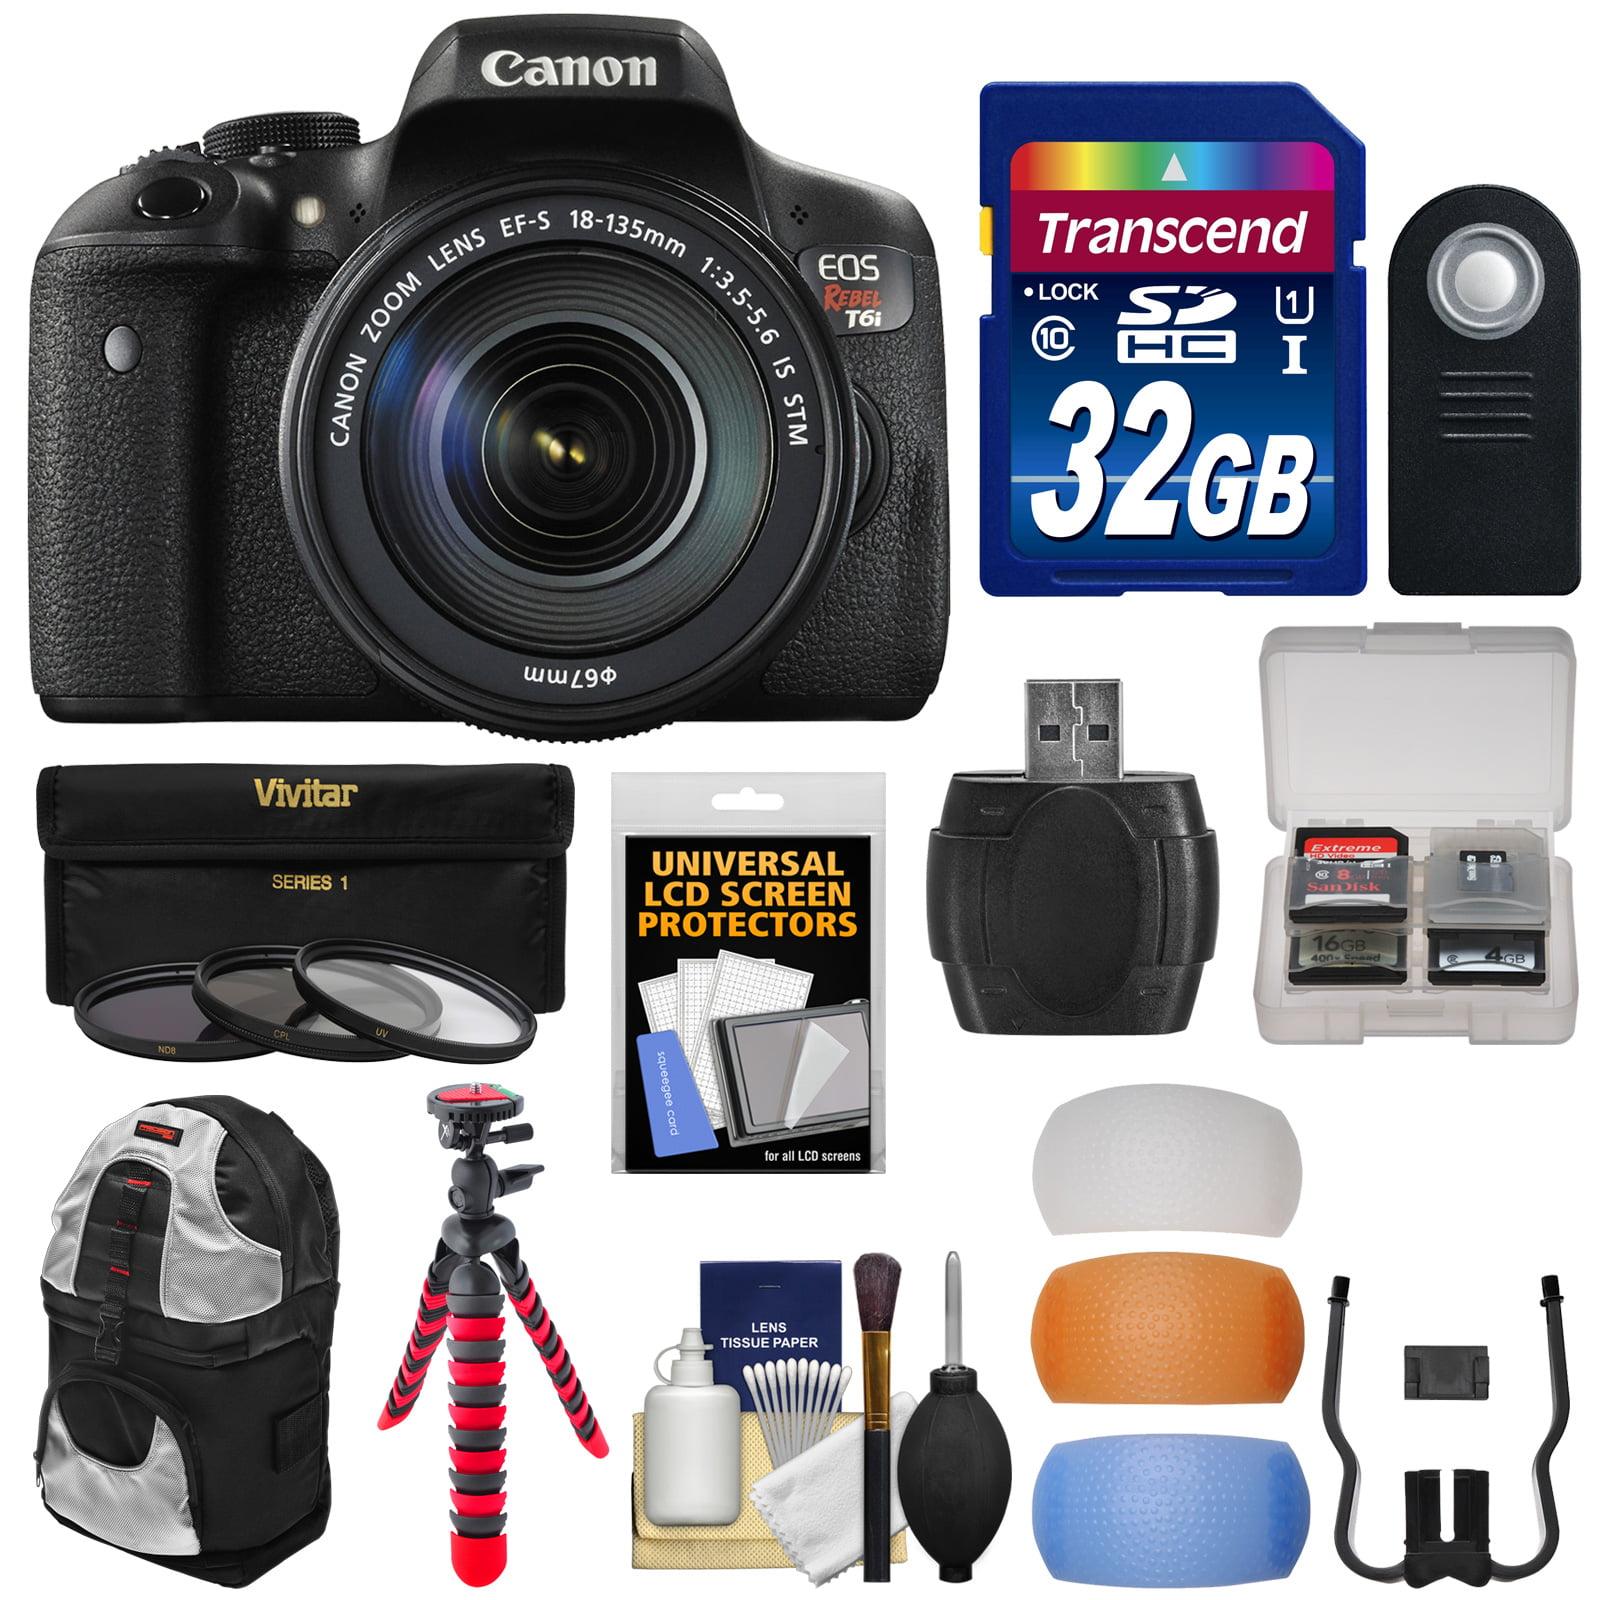 5d5def51 0952 4fce b98e 37081321e9fd 1.2e2dadde8b4fb3bce9e45aa005a5e14d - Canon EOS Rebel T6/EOS 1300D review